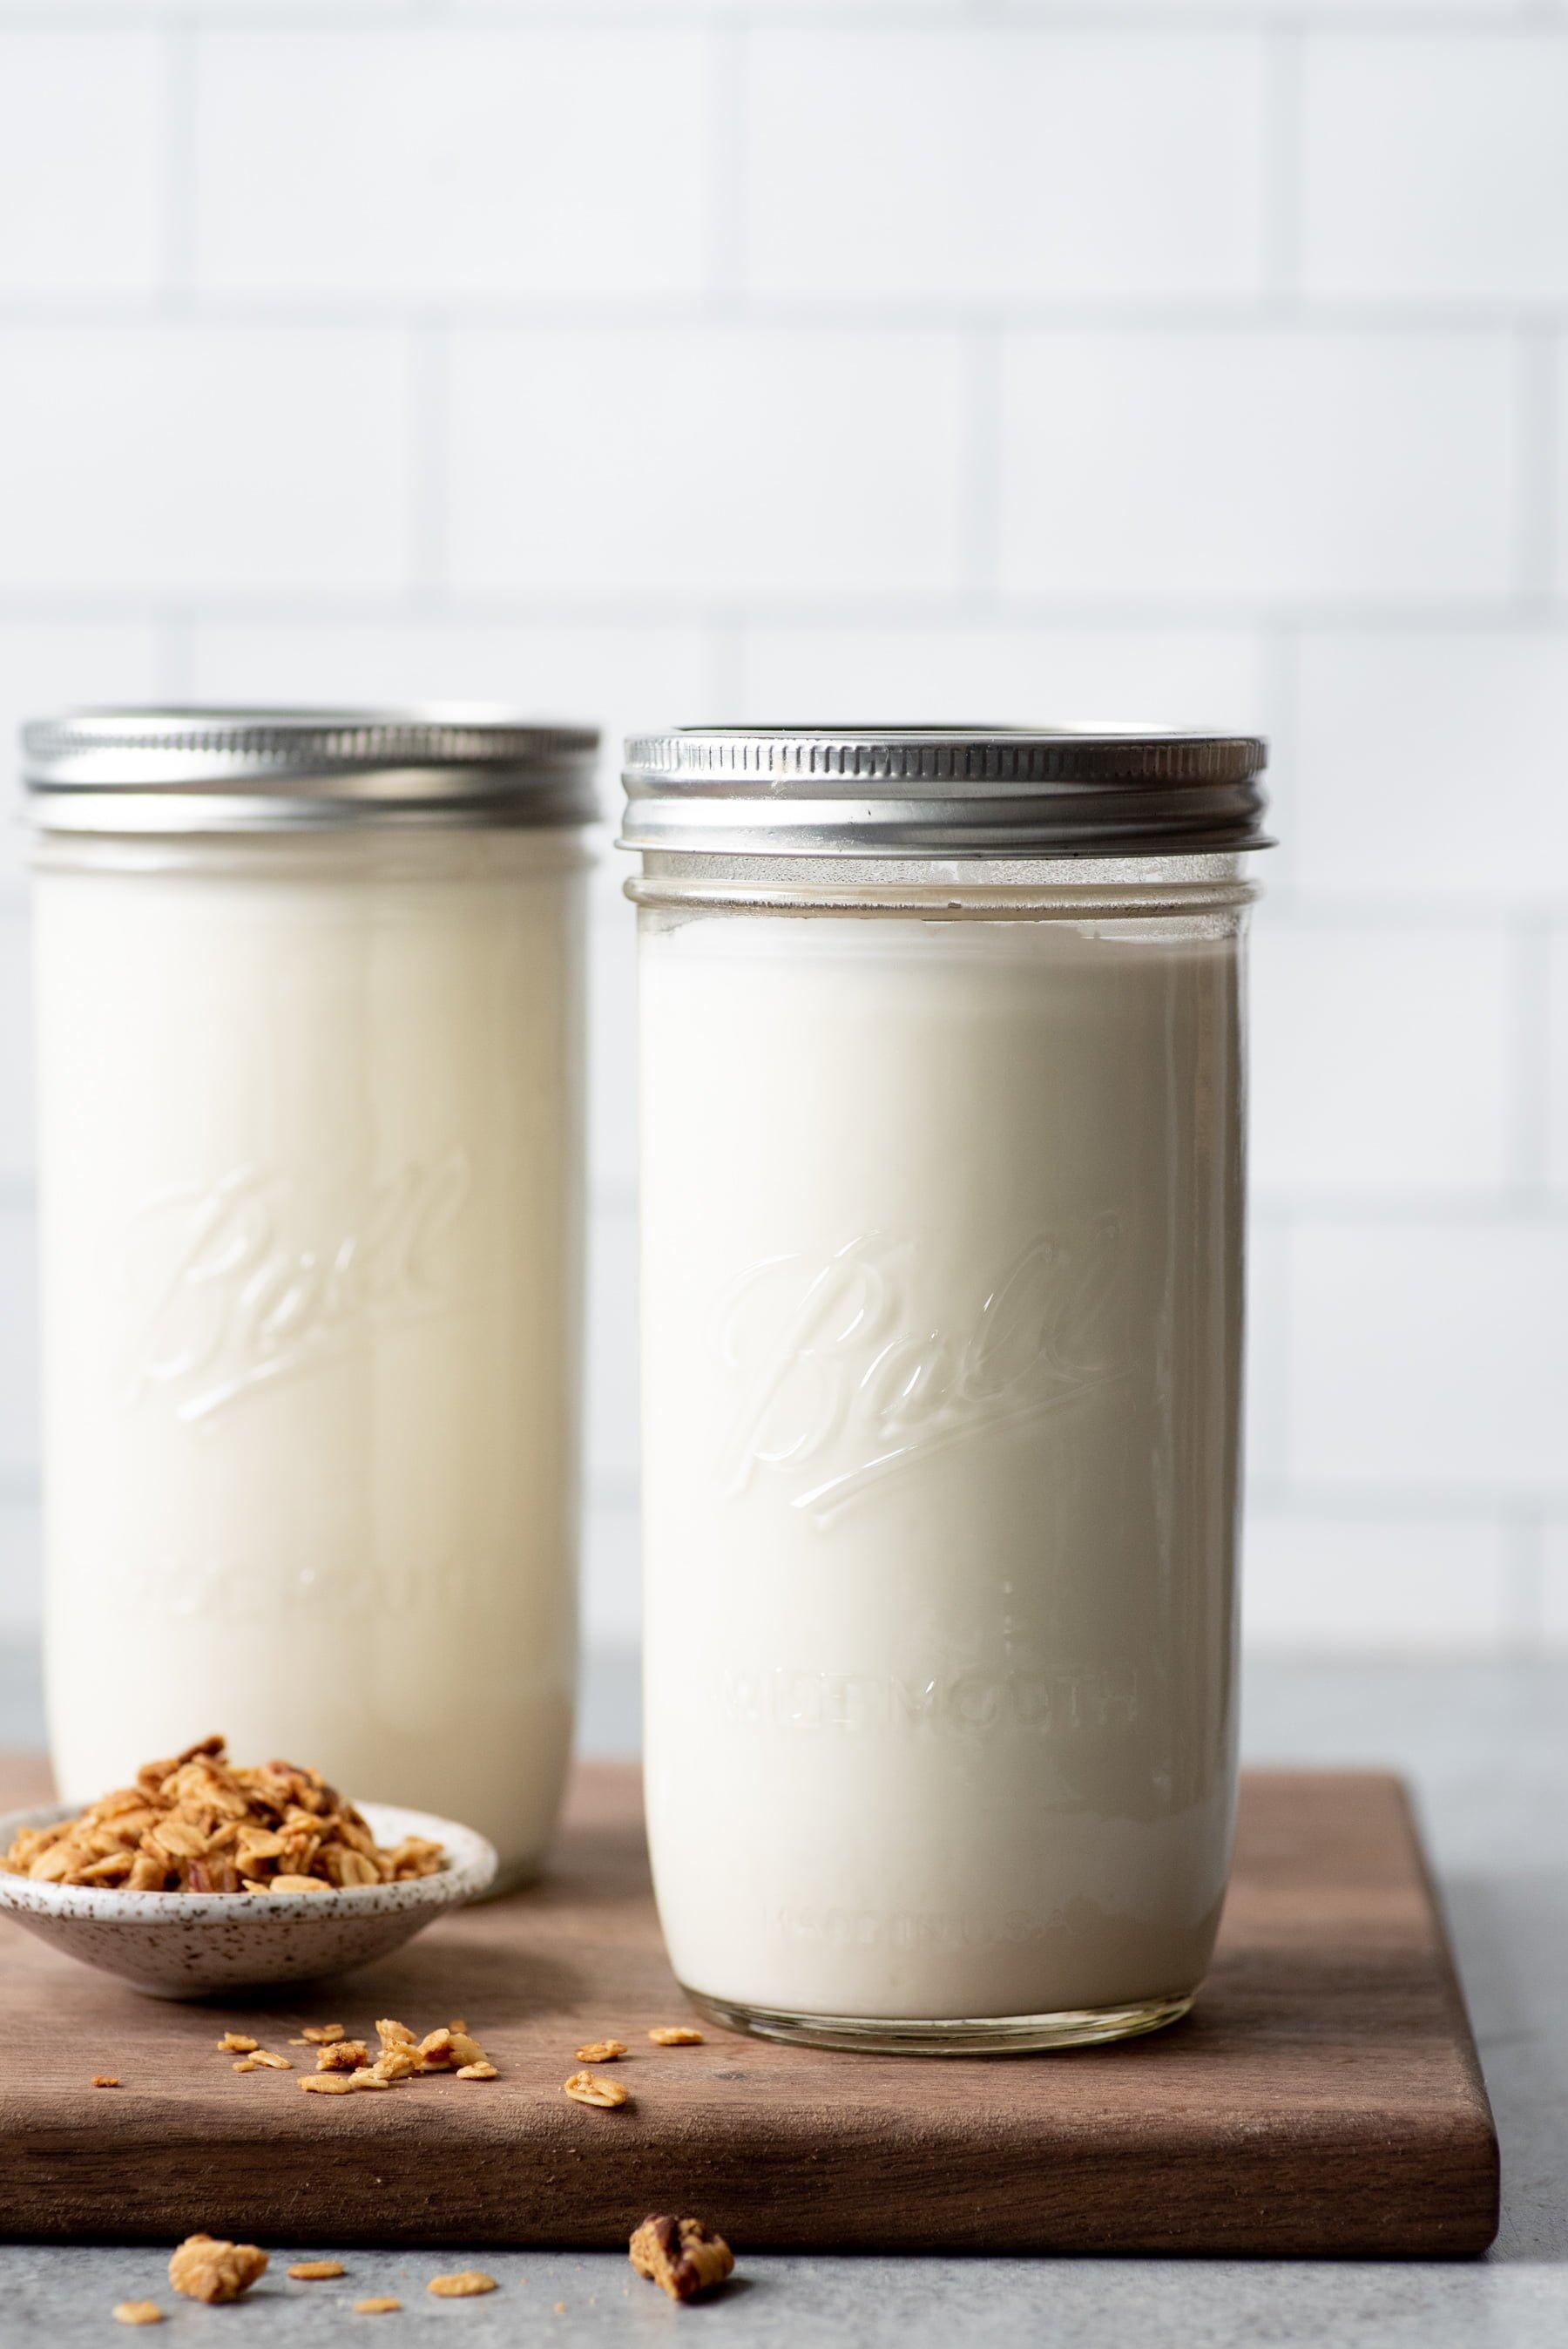 Homemade 24-hour yogurt in two glass jars